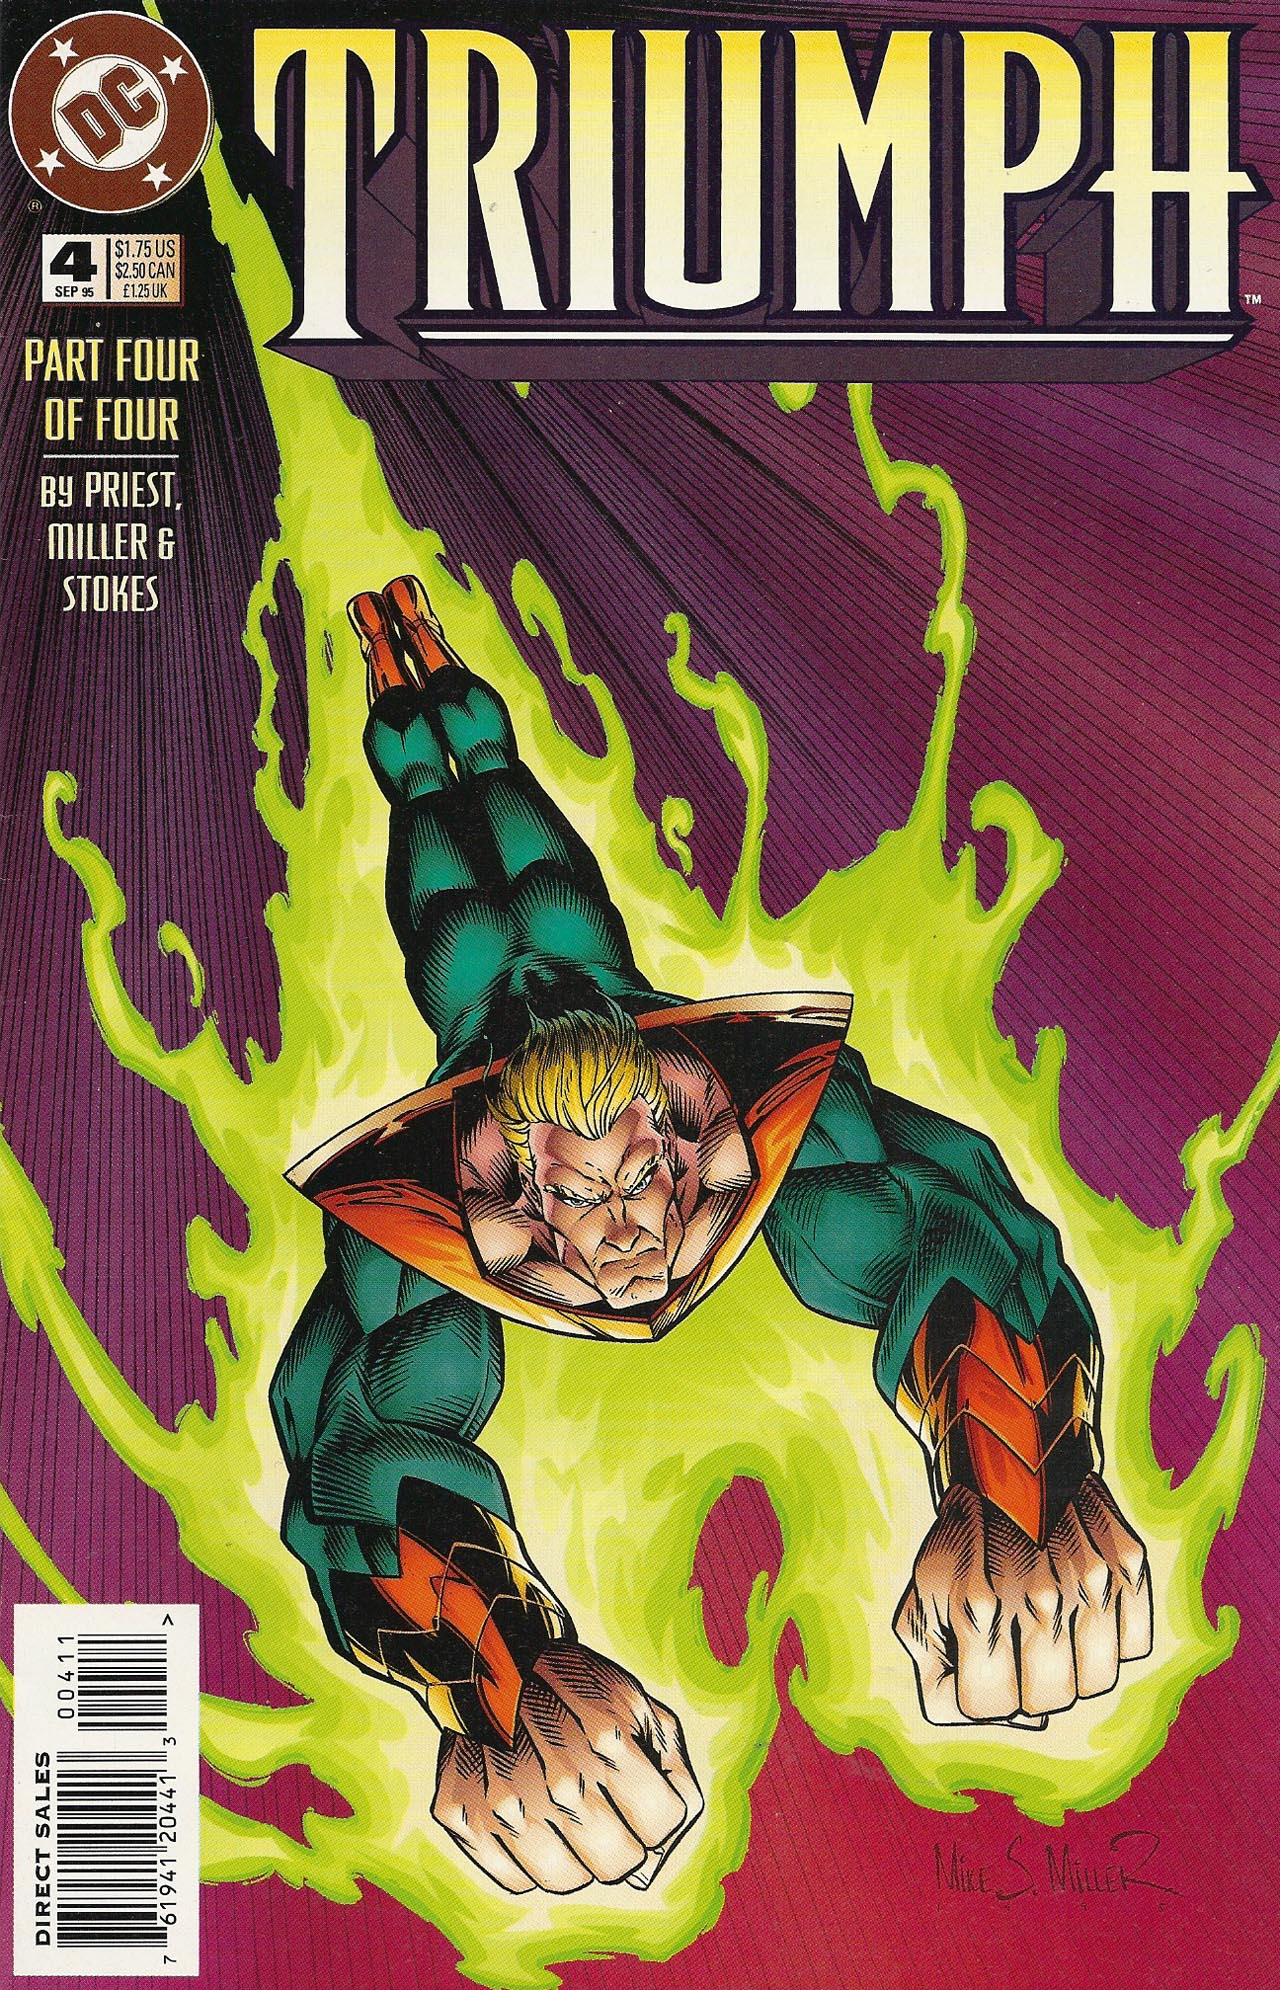 Read online Triumph comic -  Issue #4 - 1